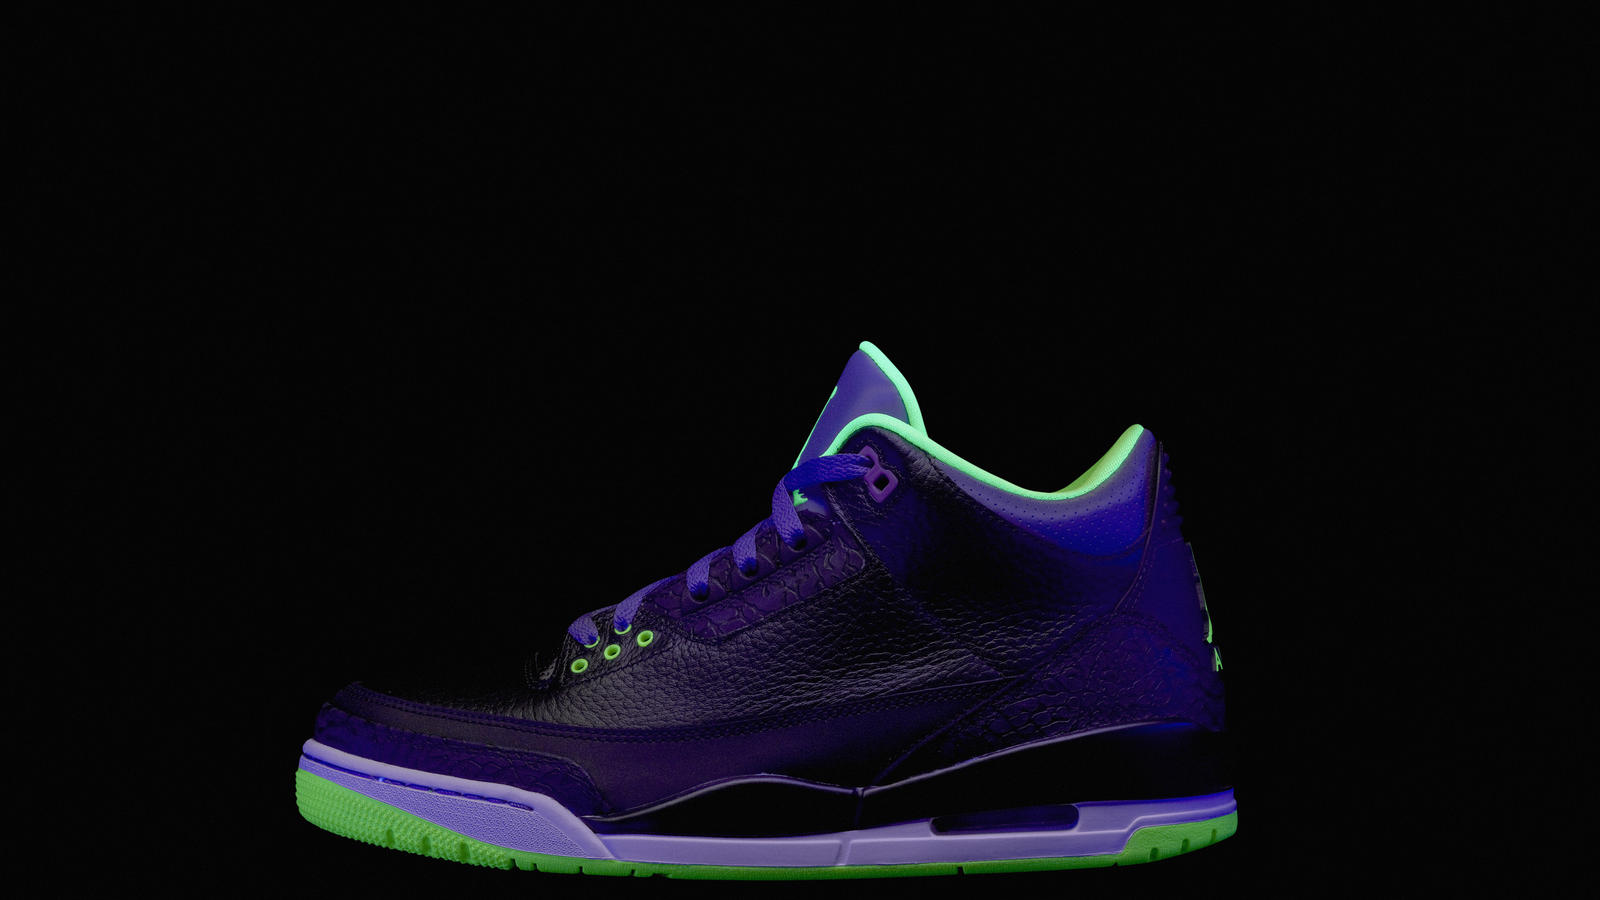 Jordan_2013_AllStar_Ftwr_AJ3_LAT_Glow_blk